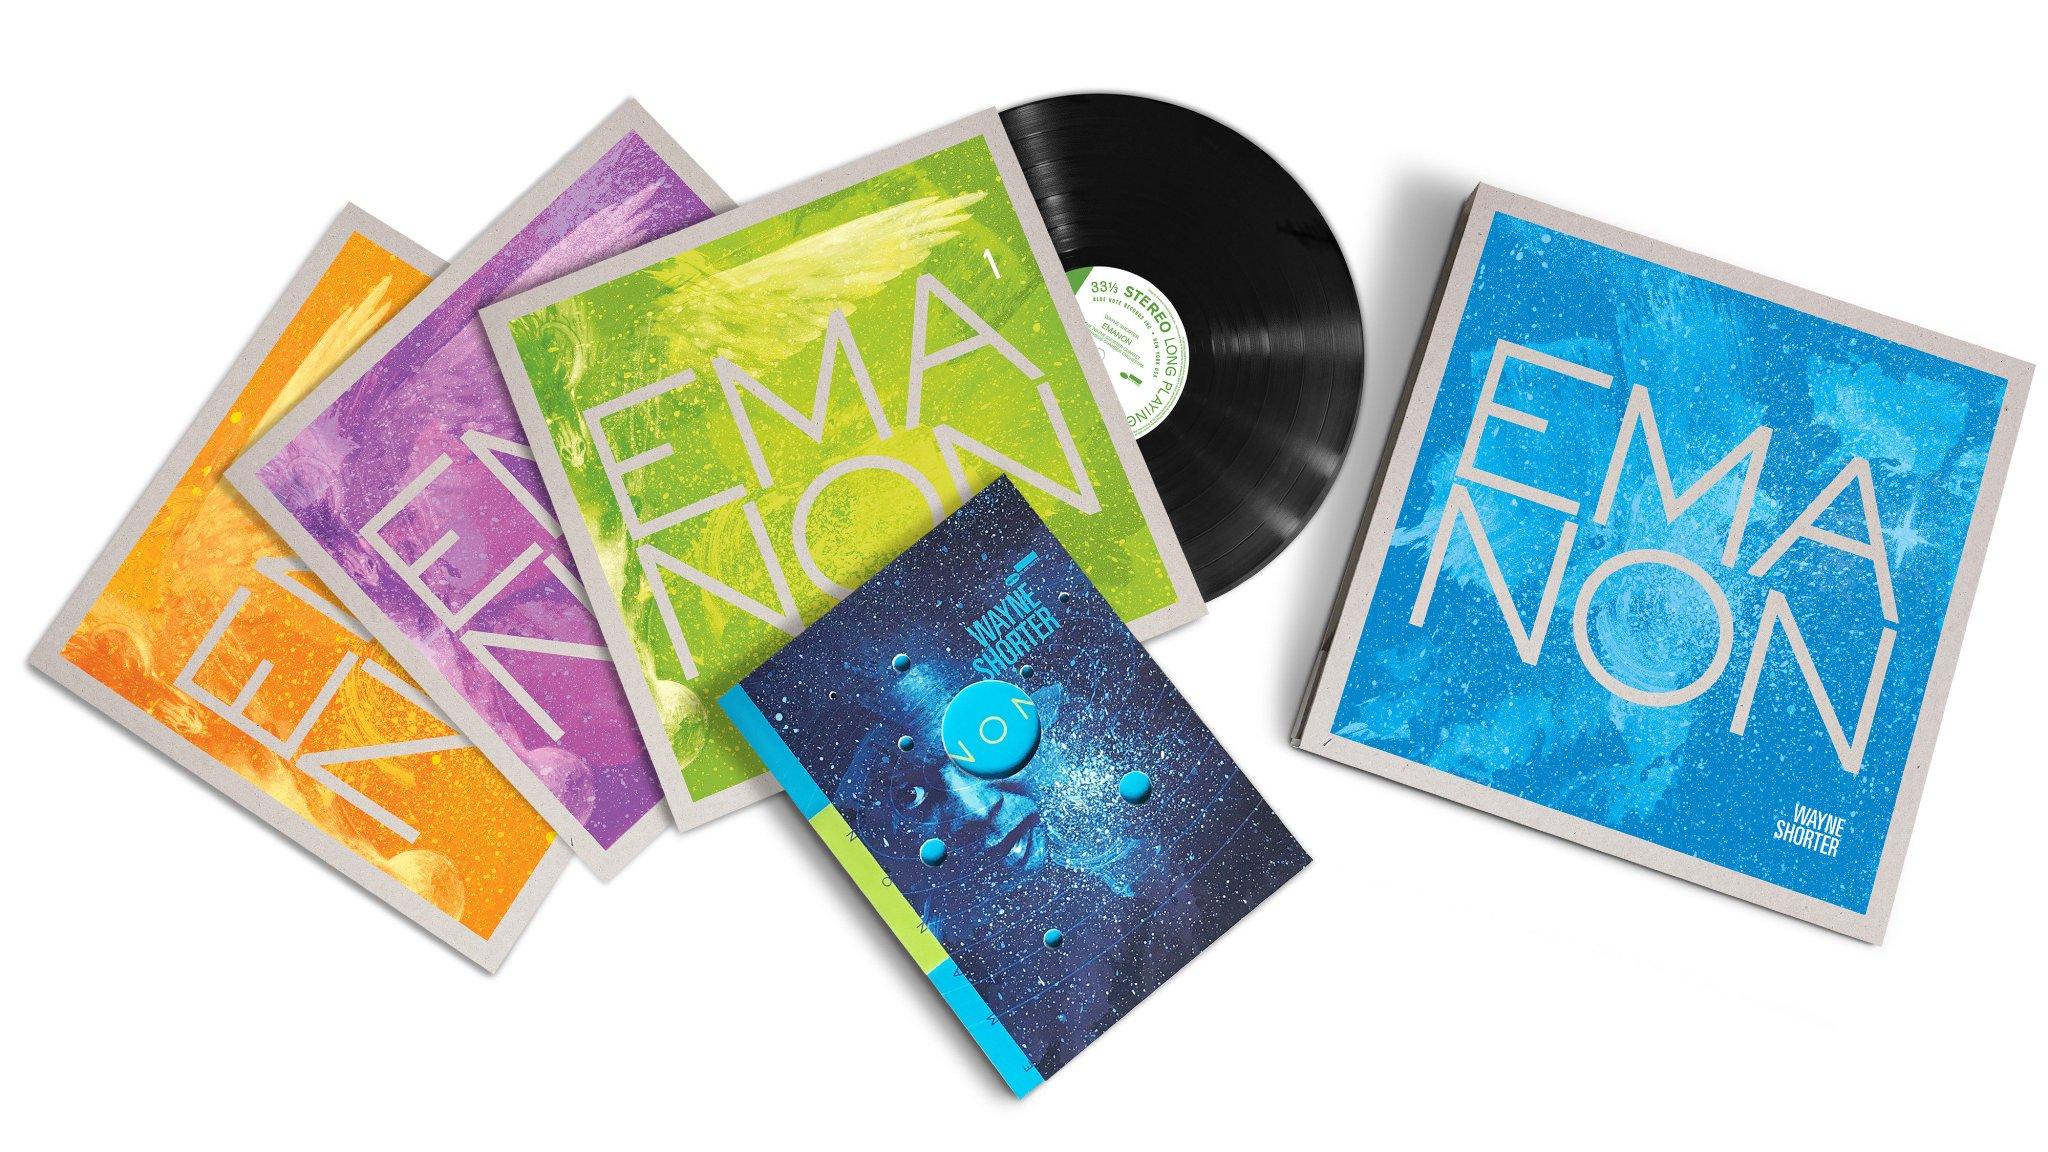 Reloaded twaddle – RT @bluenoterecords: Presenting @Wayne_Shorter #Emanon! New triple album Wayne S...